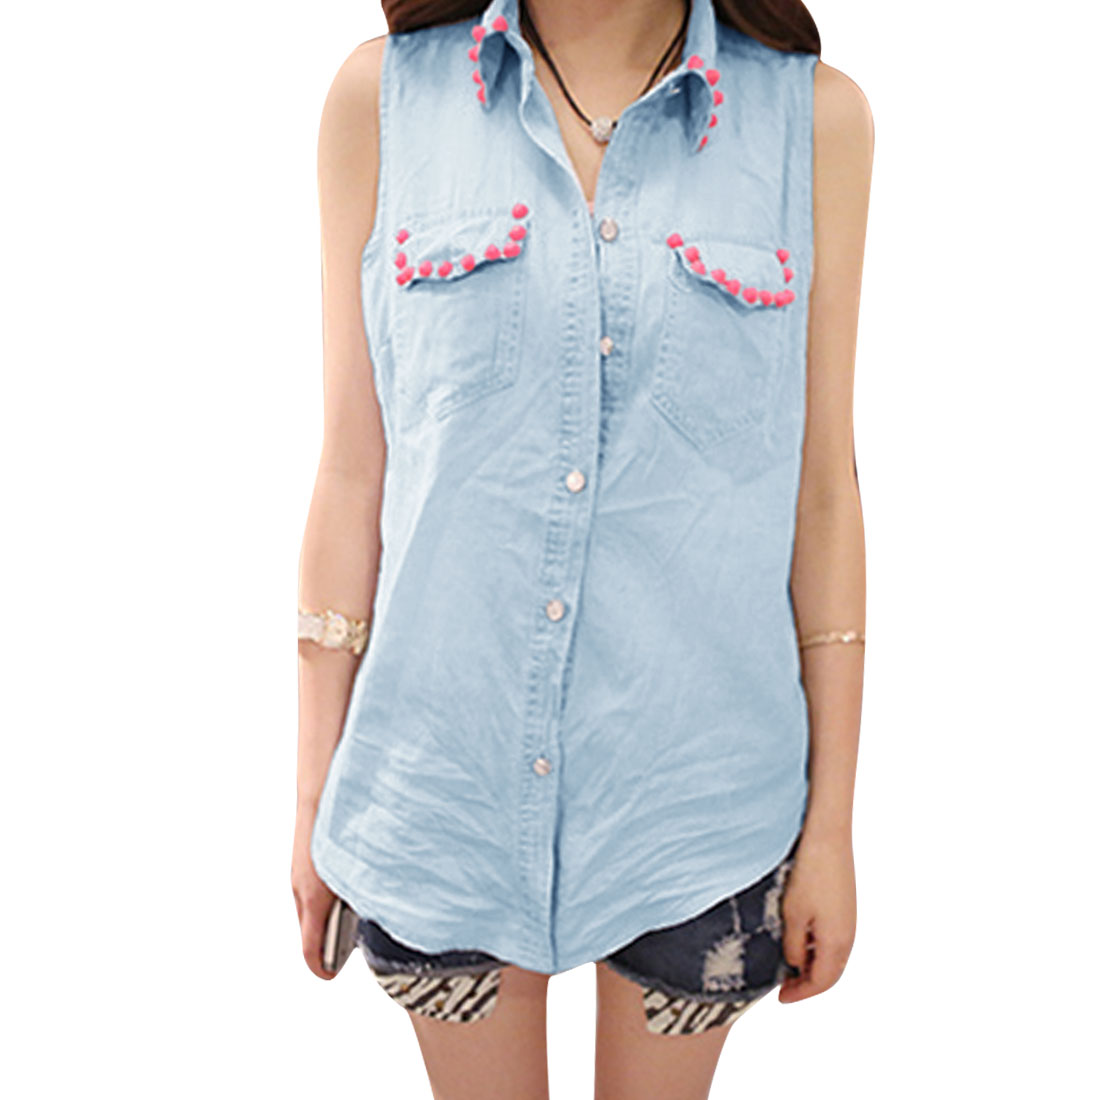 Ladies Sleeveless Design Point Collar Button Front Blouse Shirt Light Blue S